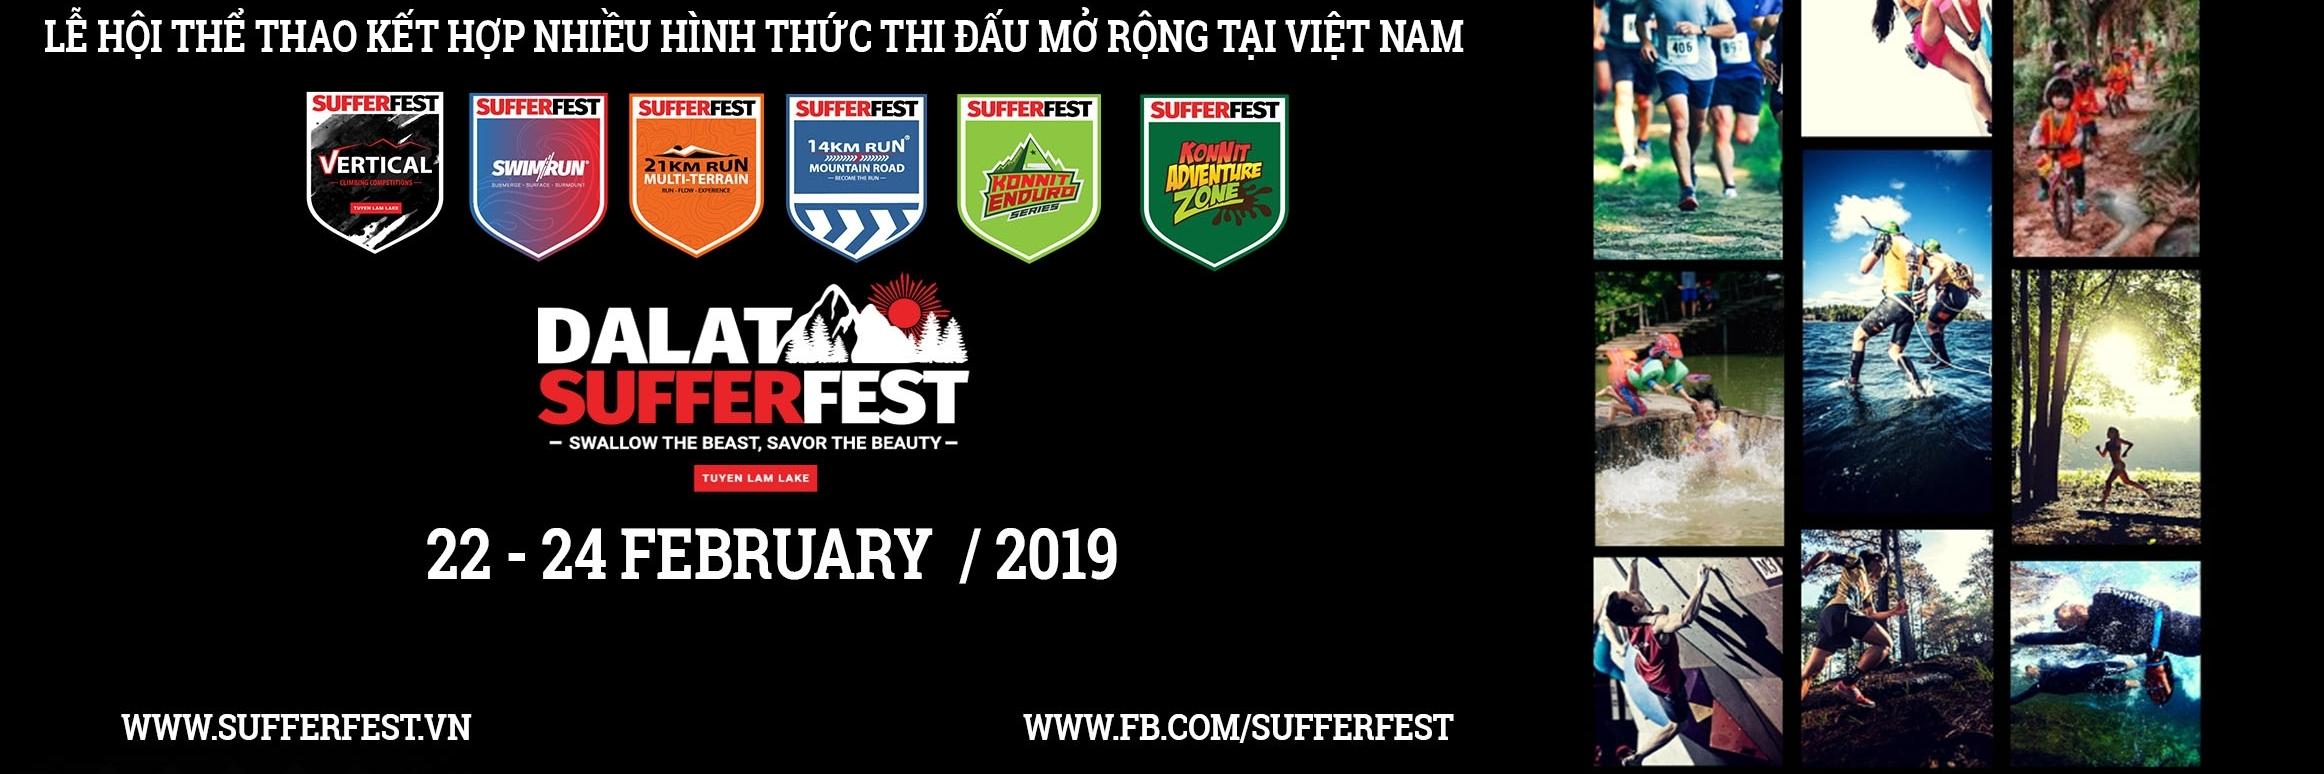 https://gody.vn/blog/bozoventuresvietnam5246/post/dalat-sufferfest-2019-le-hoi-the-thao-ket-hop-nhieu-hinh-thuc-thi-dau-mo-rong-tai-viet-nam-2060